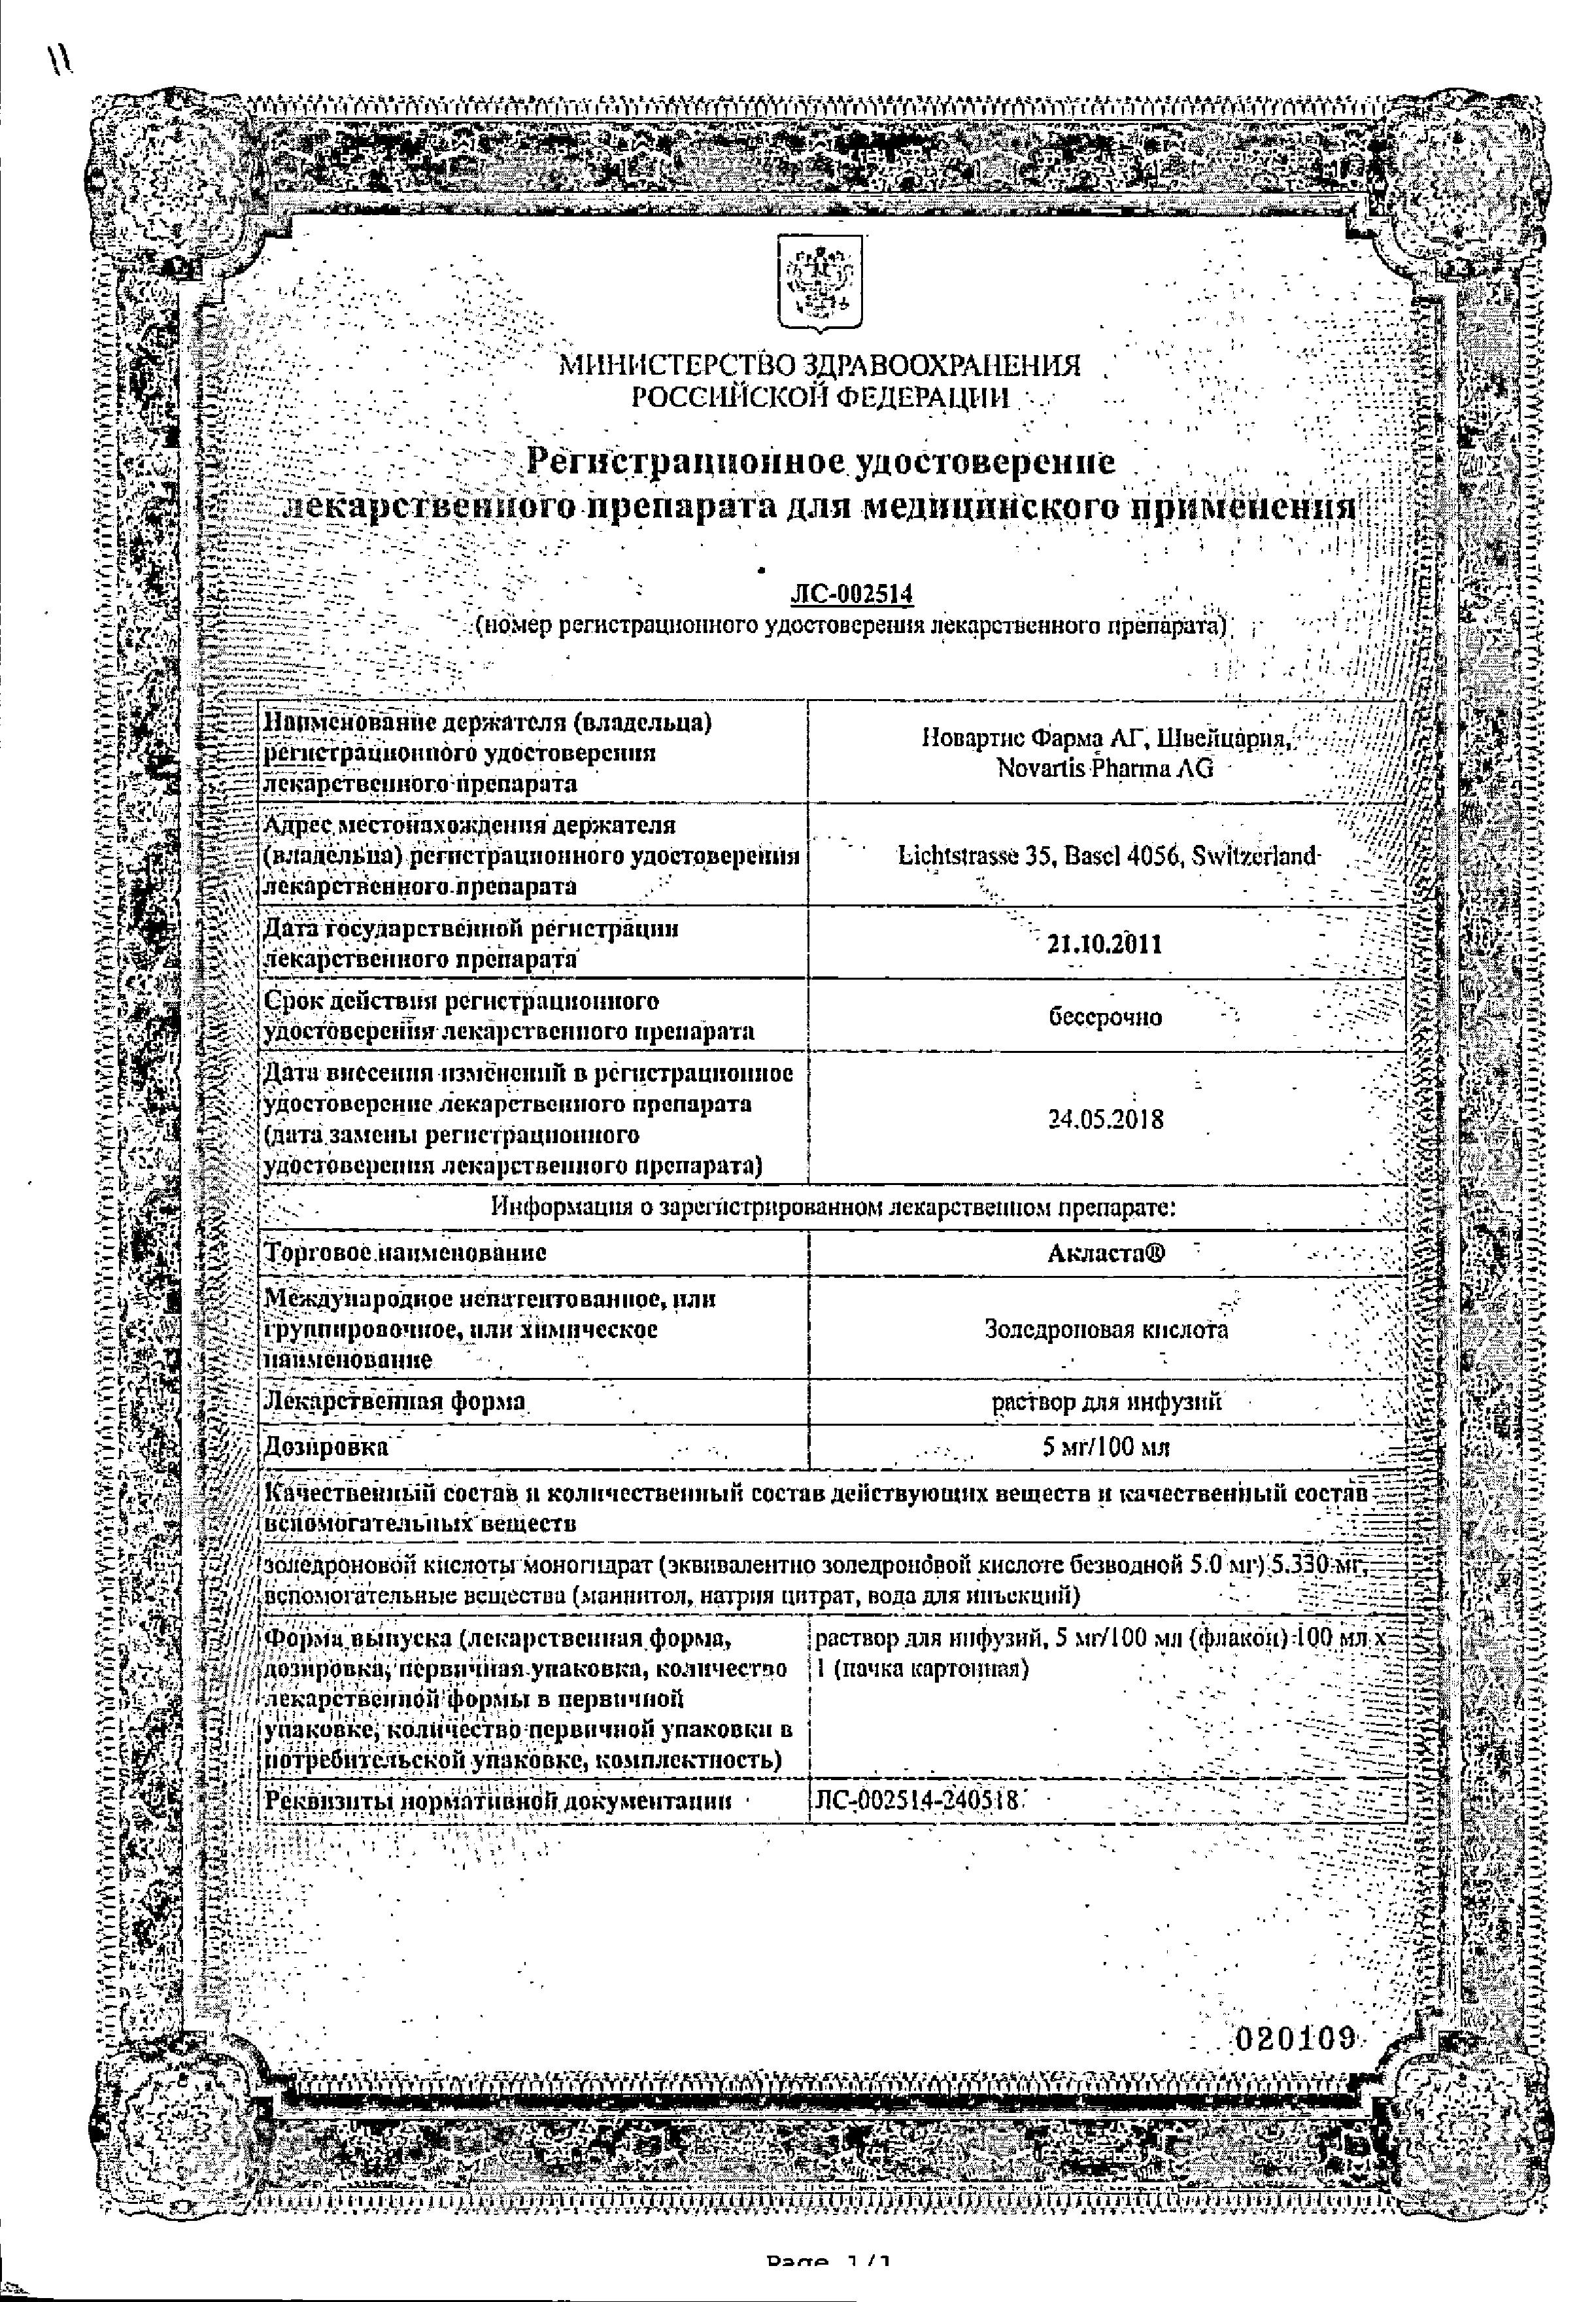 Акласта сертификат